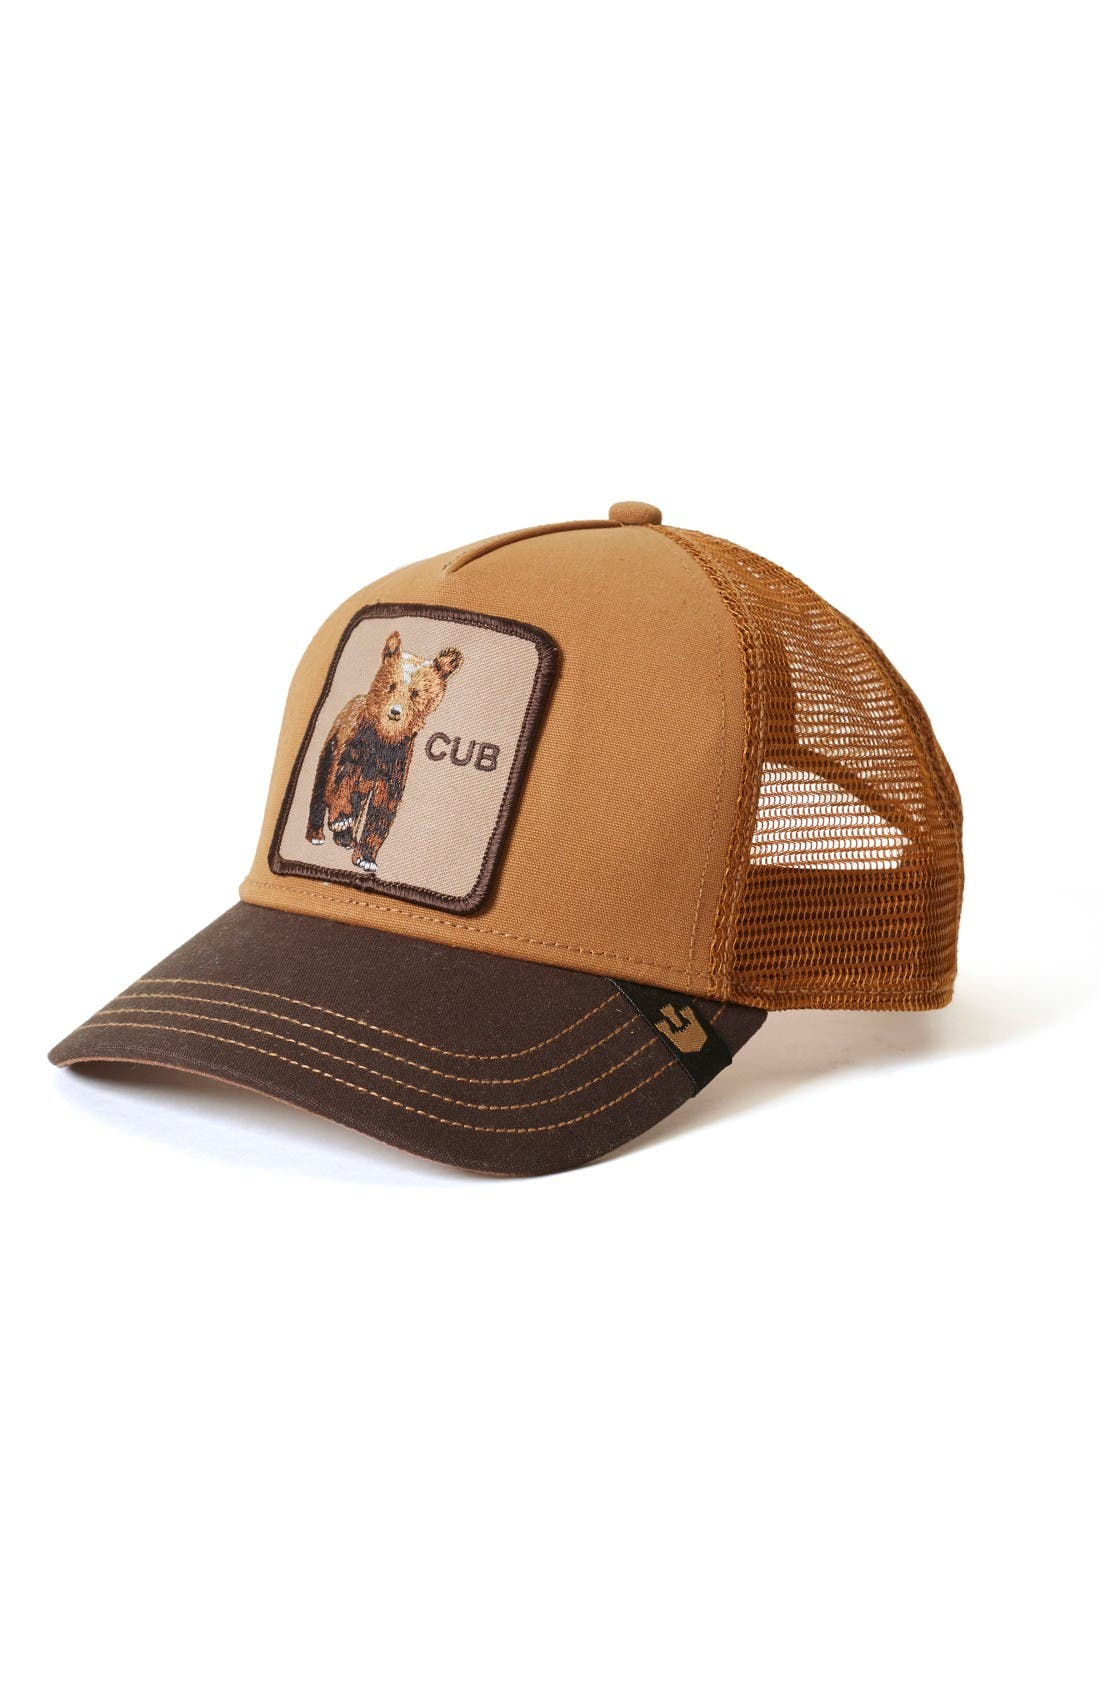 Main Image - Goorin Brothers Cub Trucker Hat